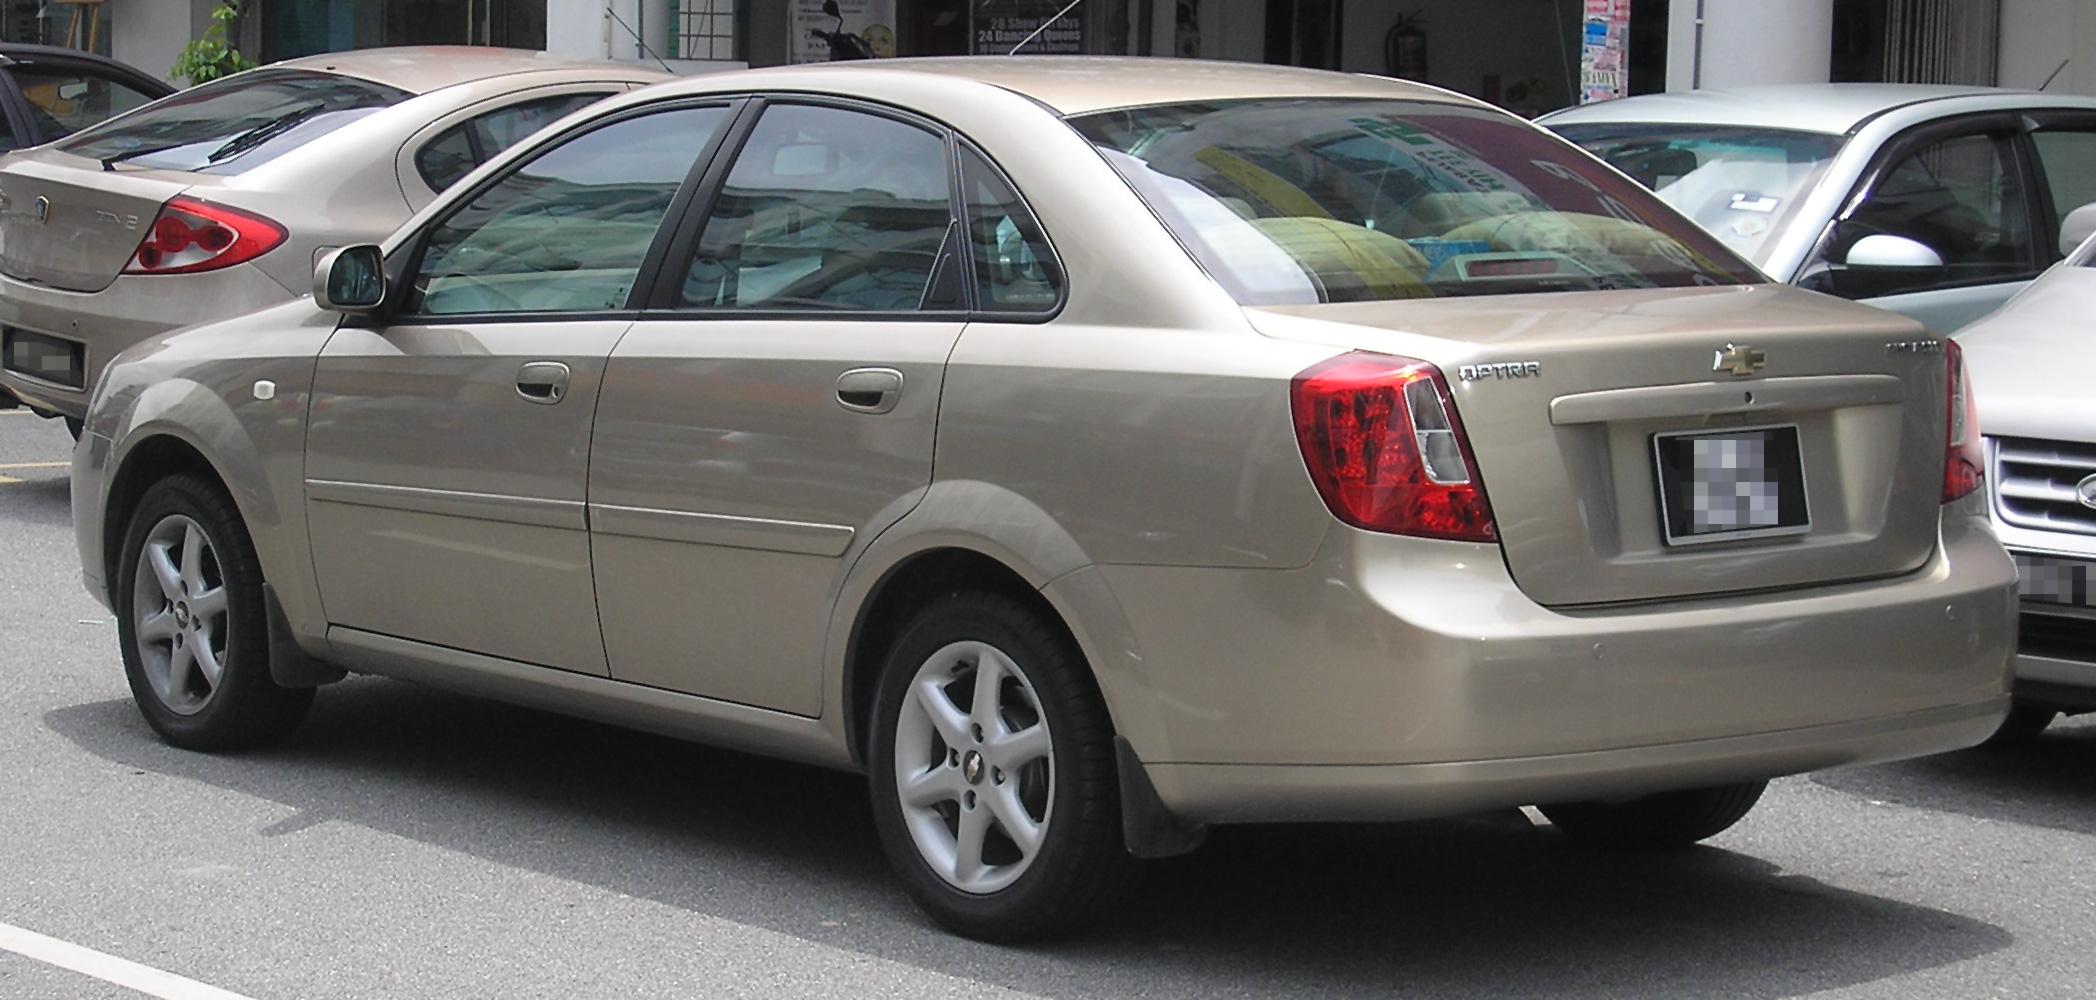 File:Chevrolet Optra (first generation) (rear), Serdang.jpg ...